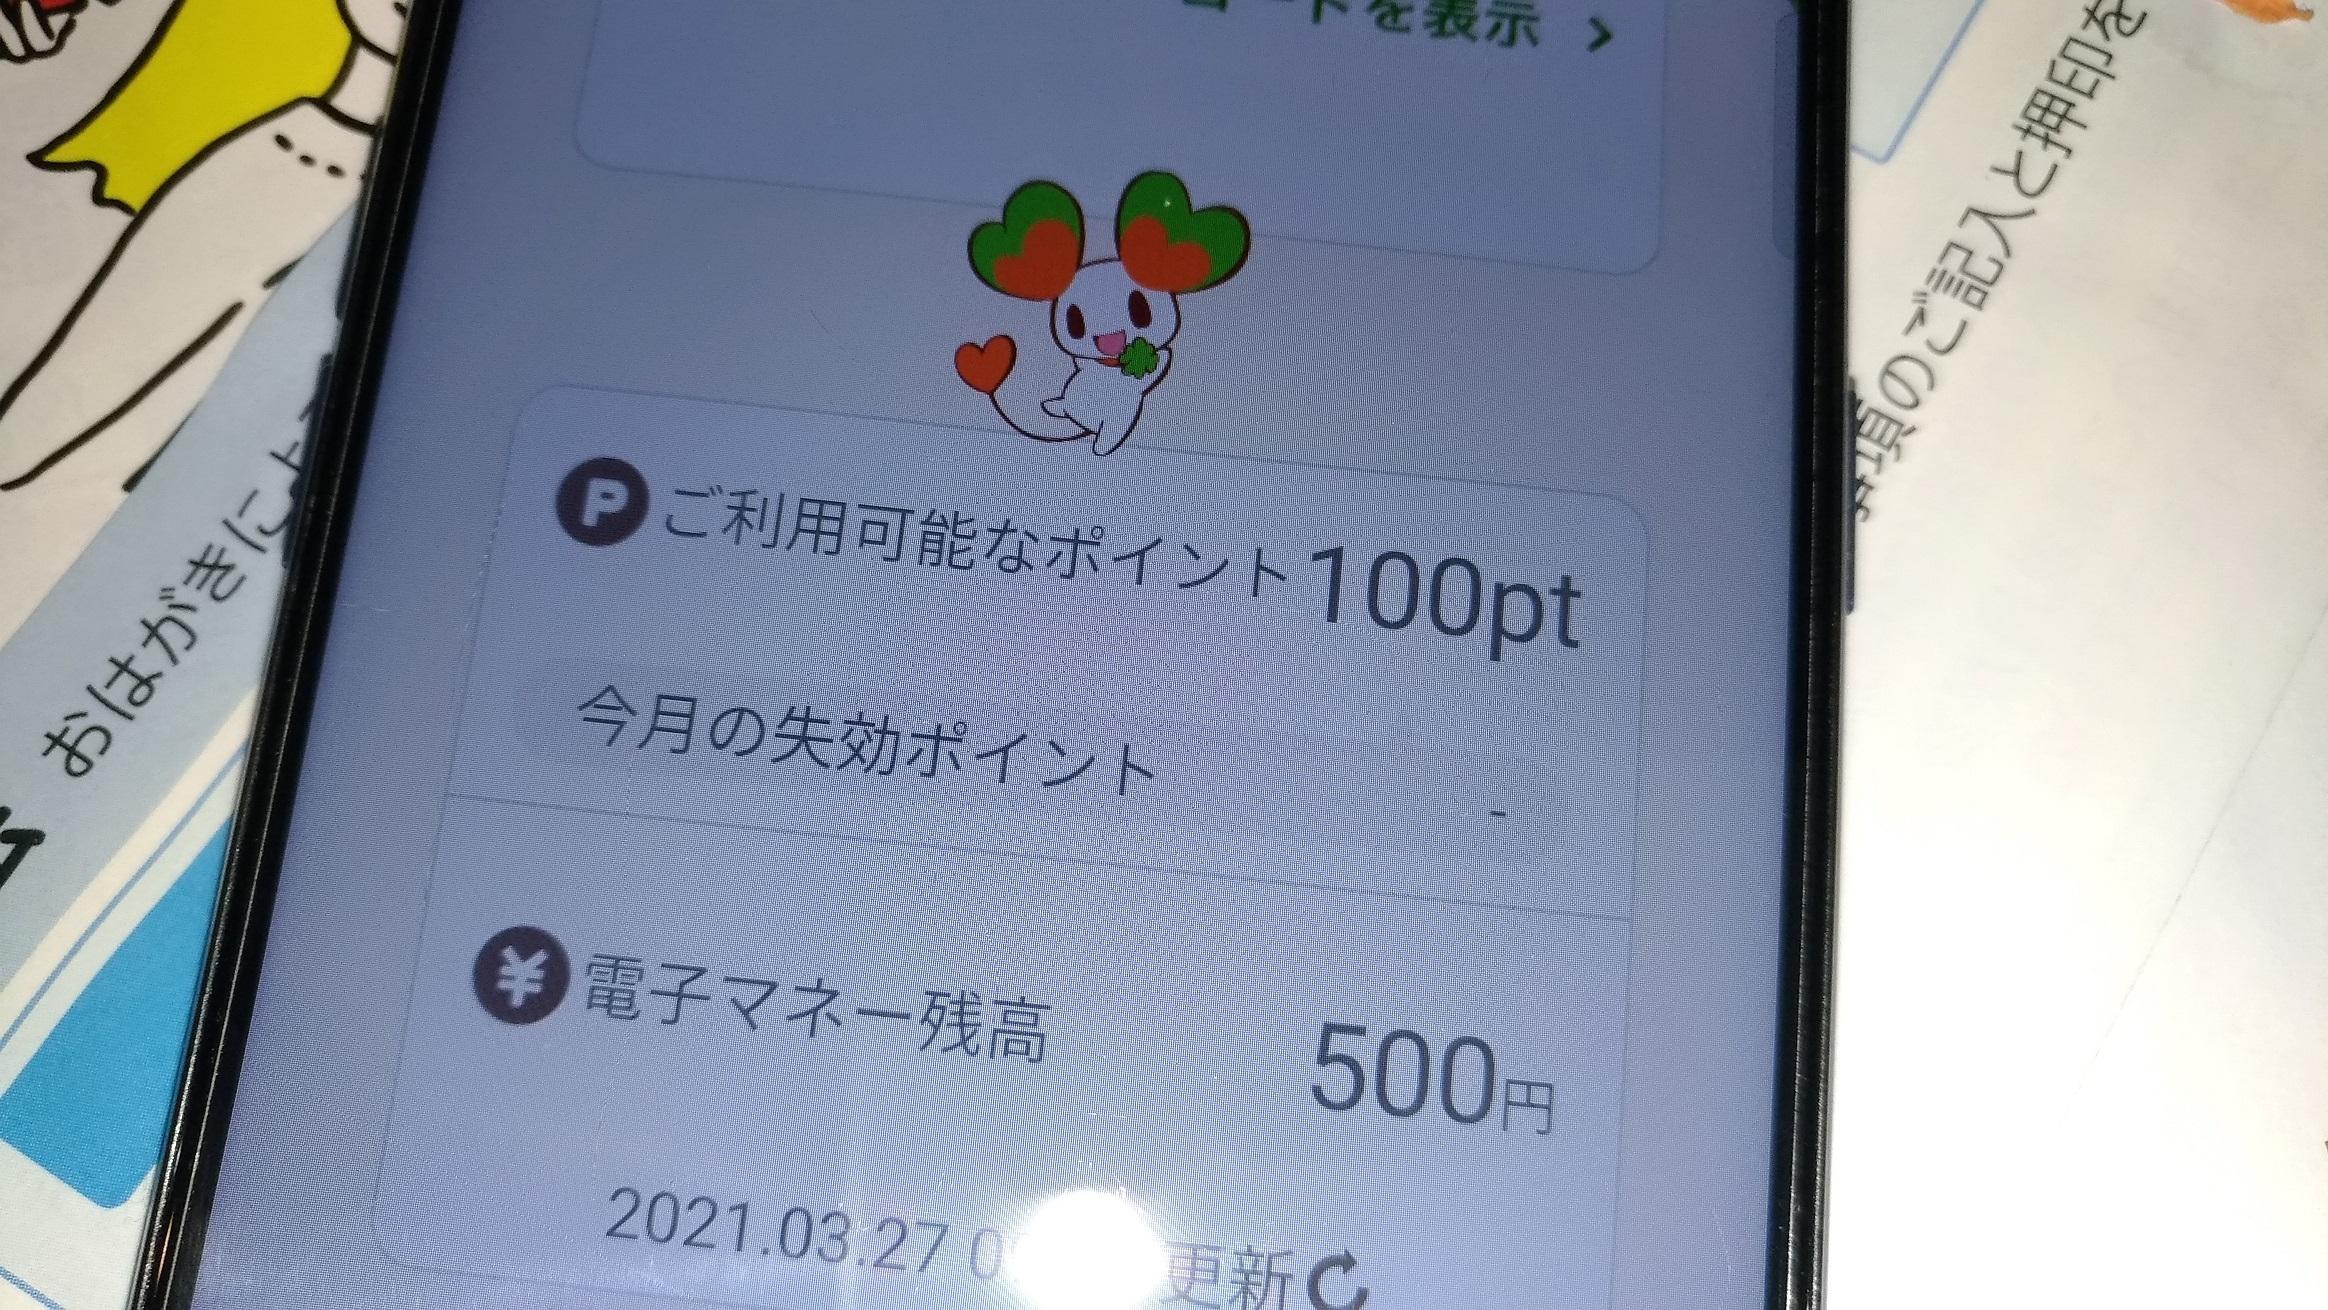 sumaho_app_life_0327_1.jpg